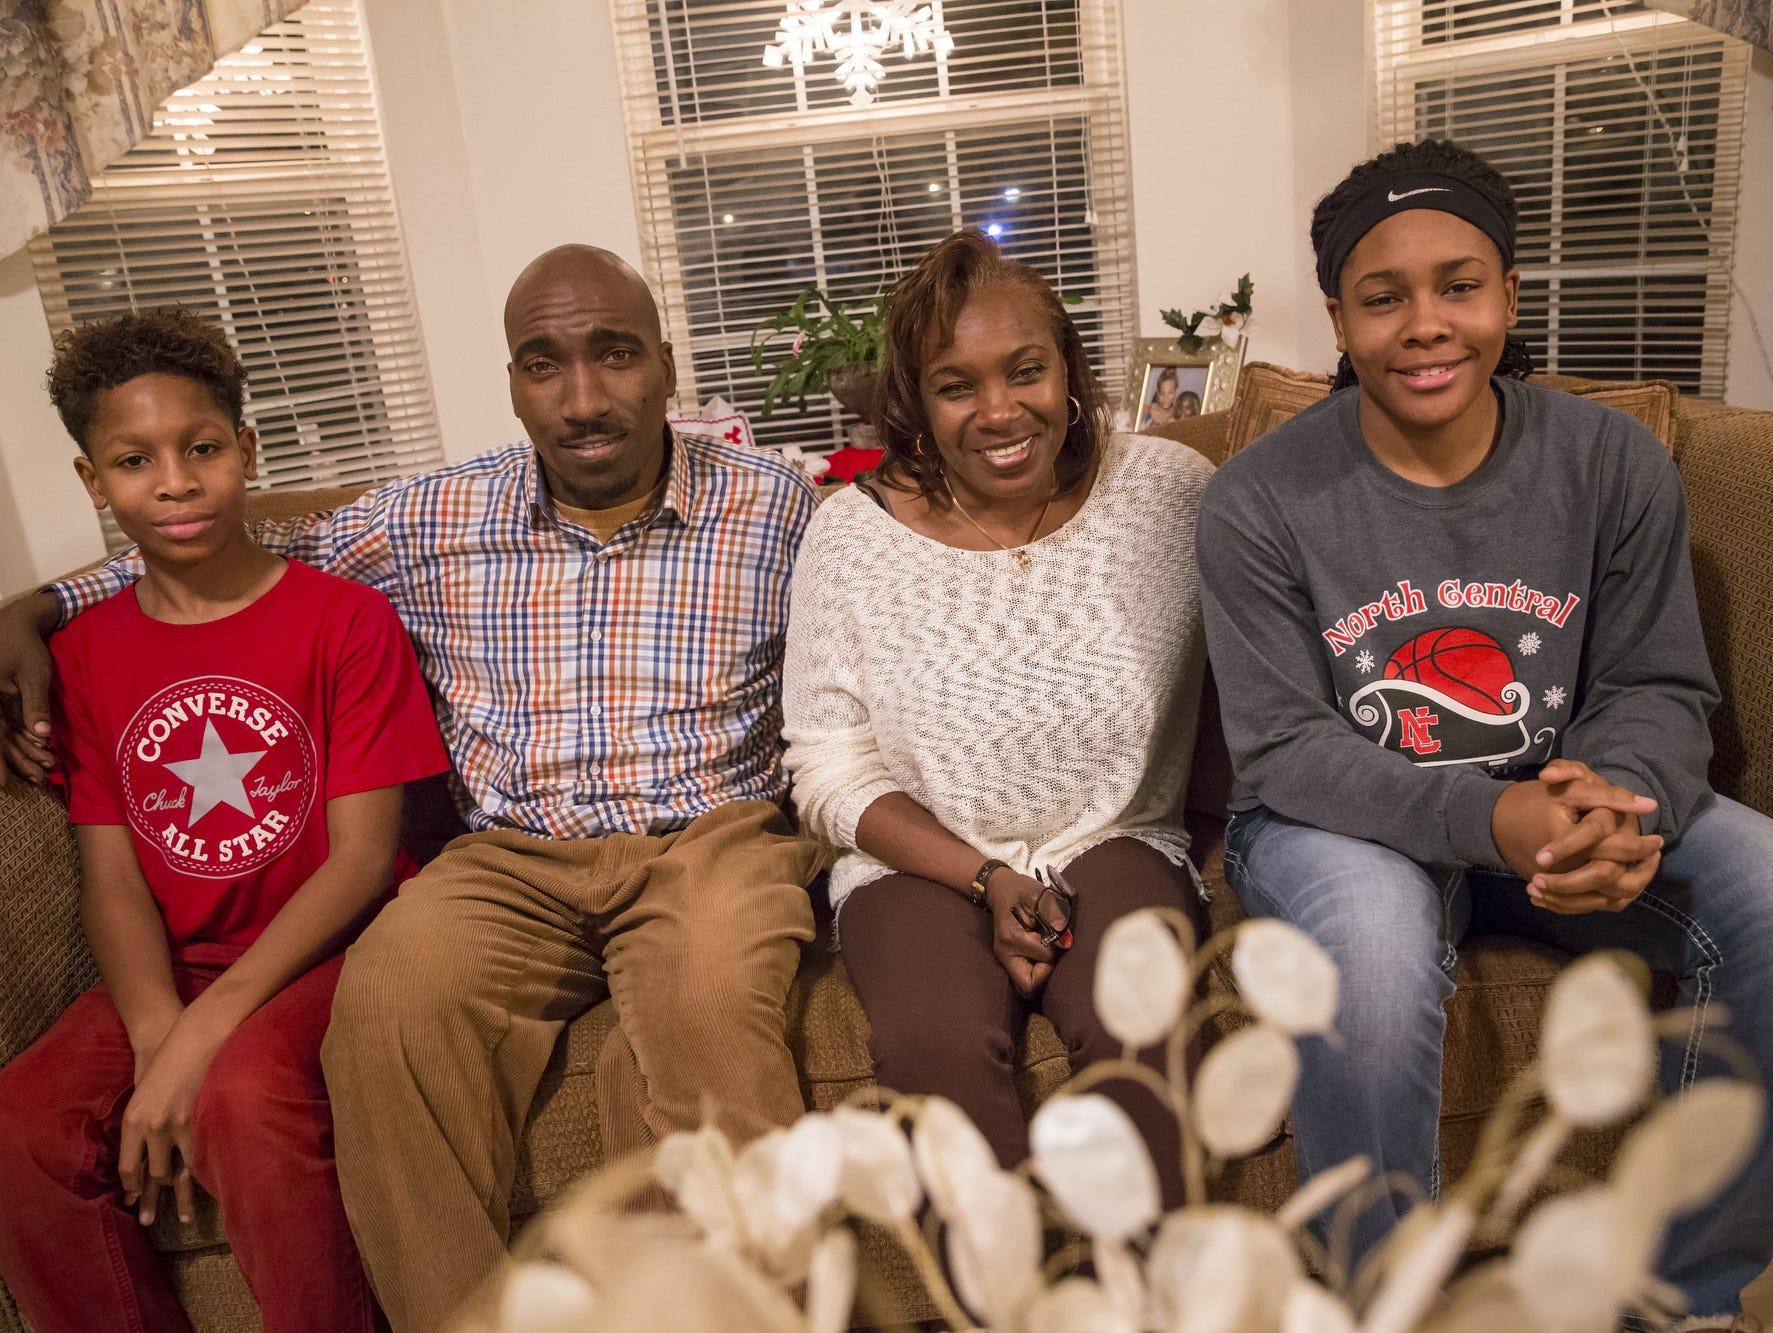 Paul Lee, Delawrence Thomas, Debra Hawkins and Ajanae Thomas pose for a portrait on Monday, Dec. 19, 2016.